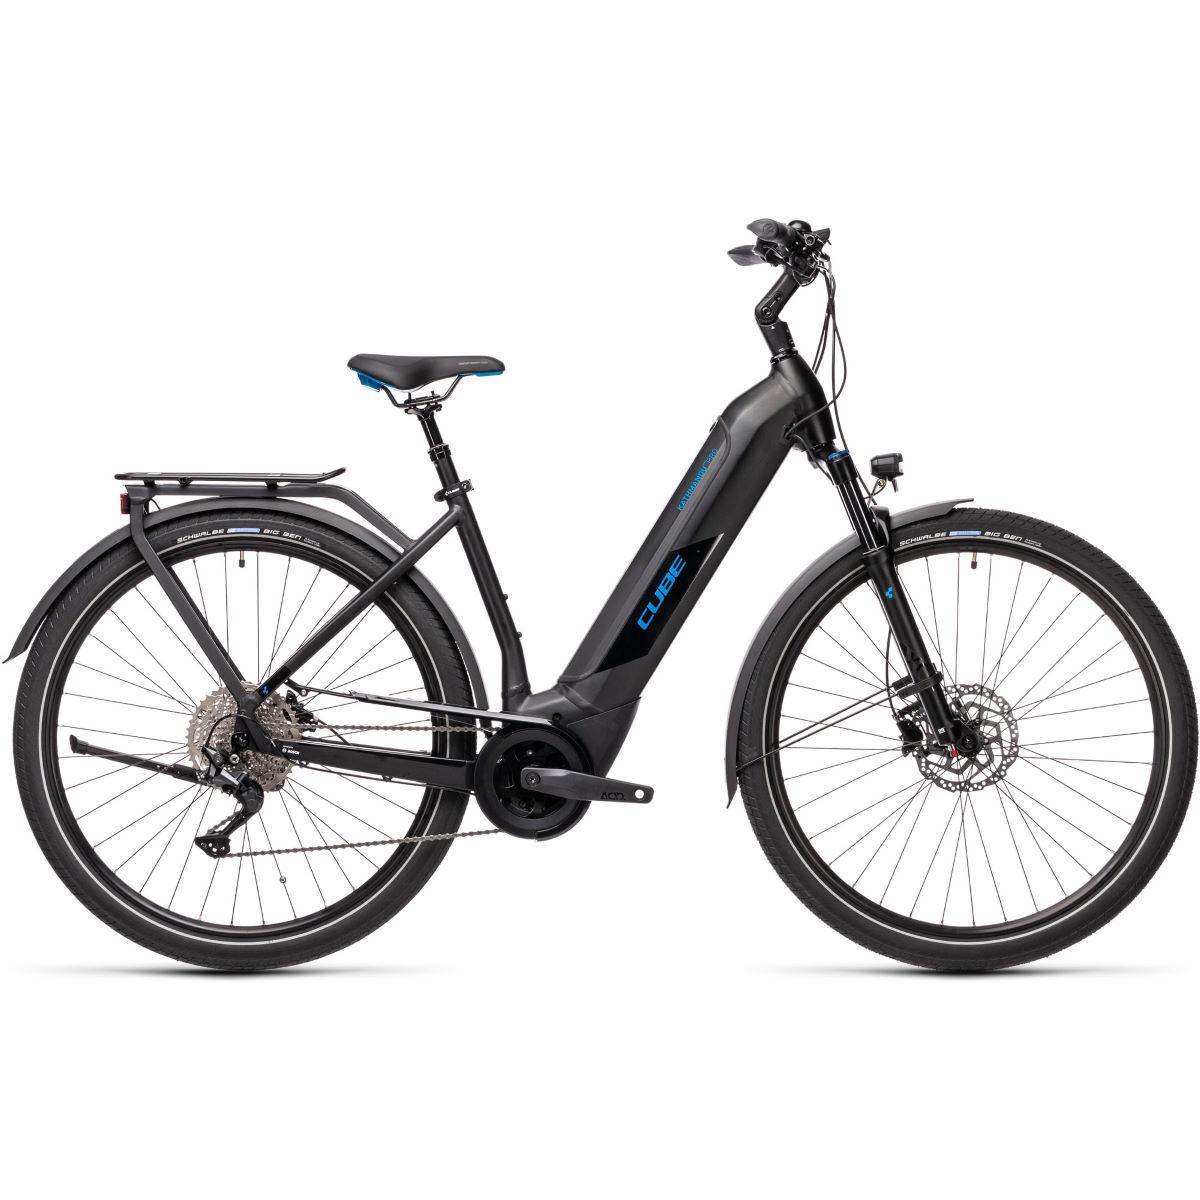 Cube Kathmandu Pro 625 EE 2021 Electric Urban Bikes